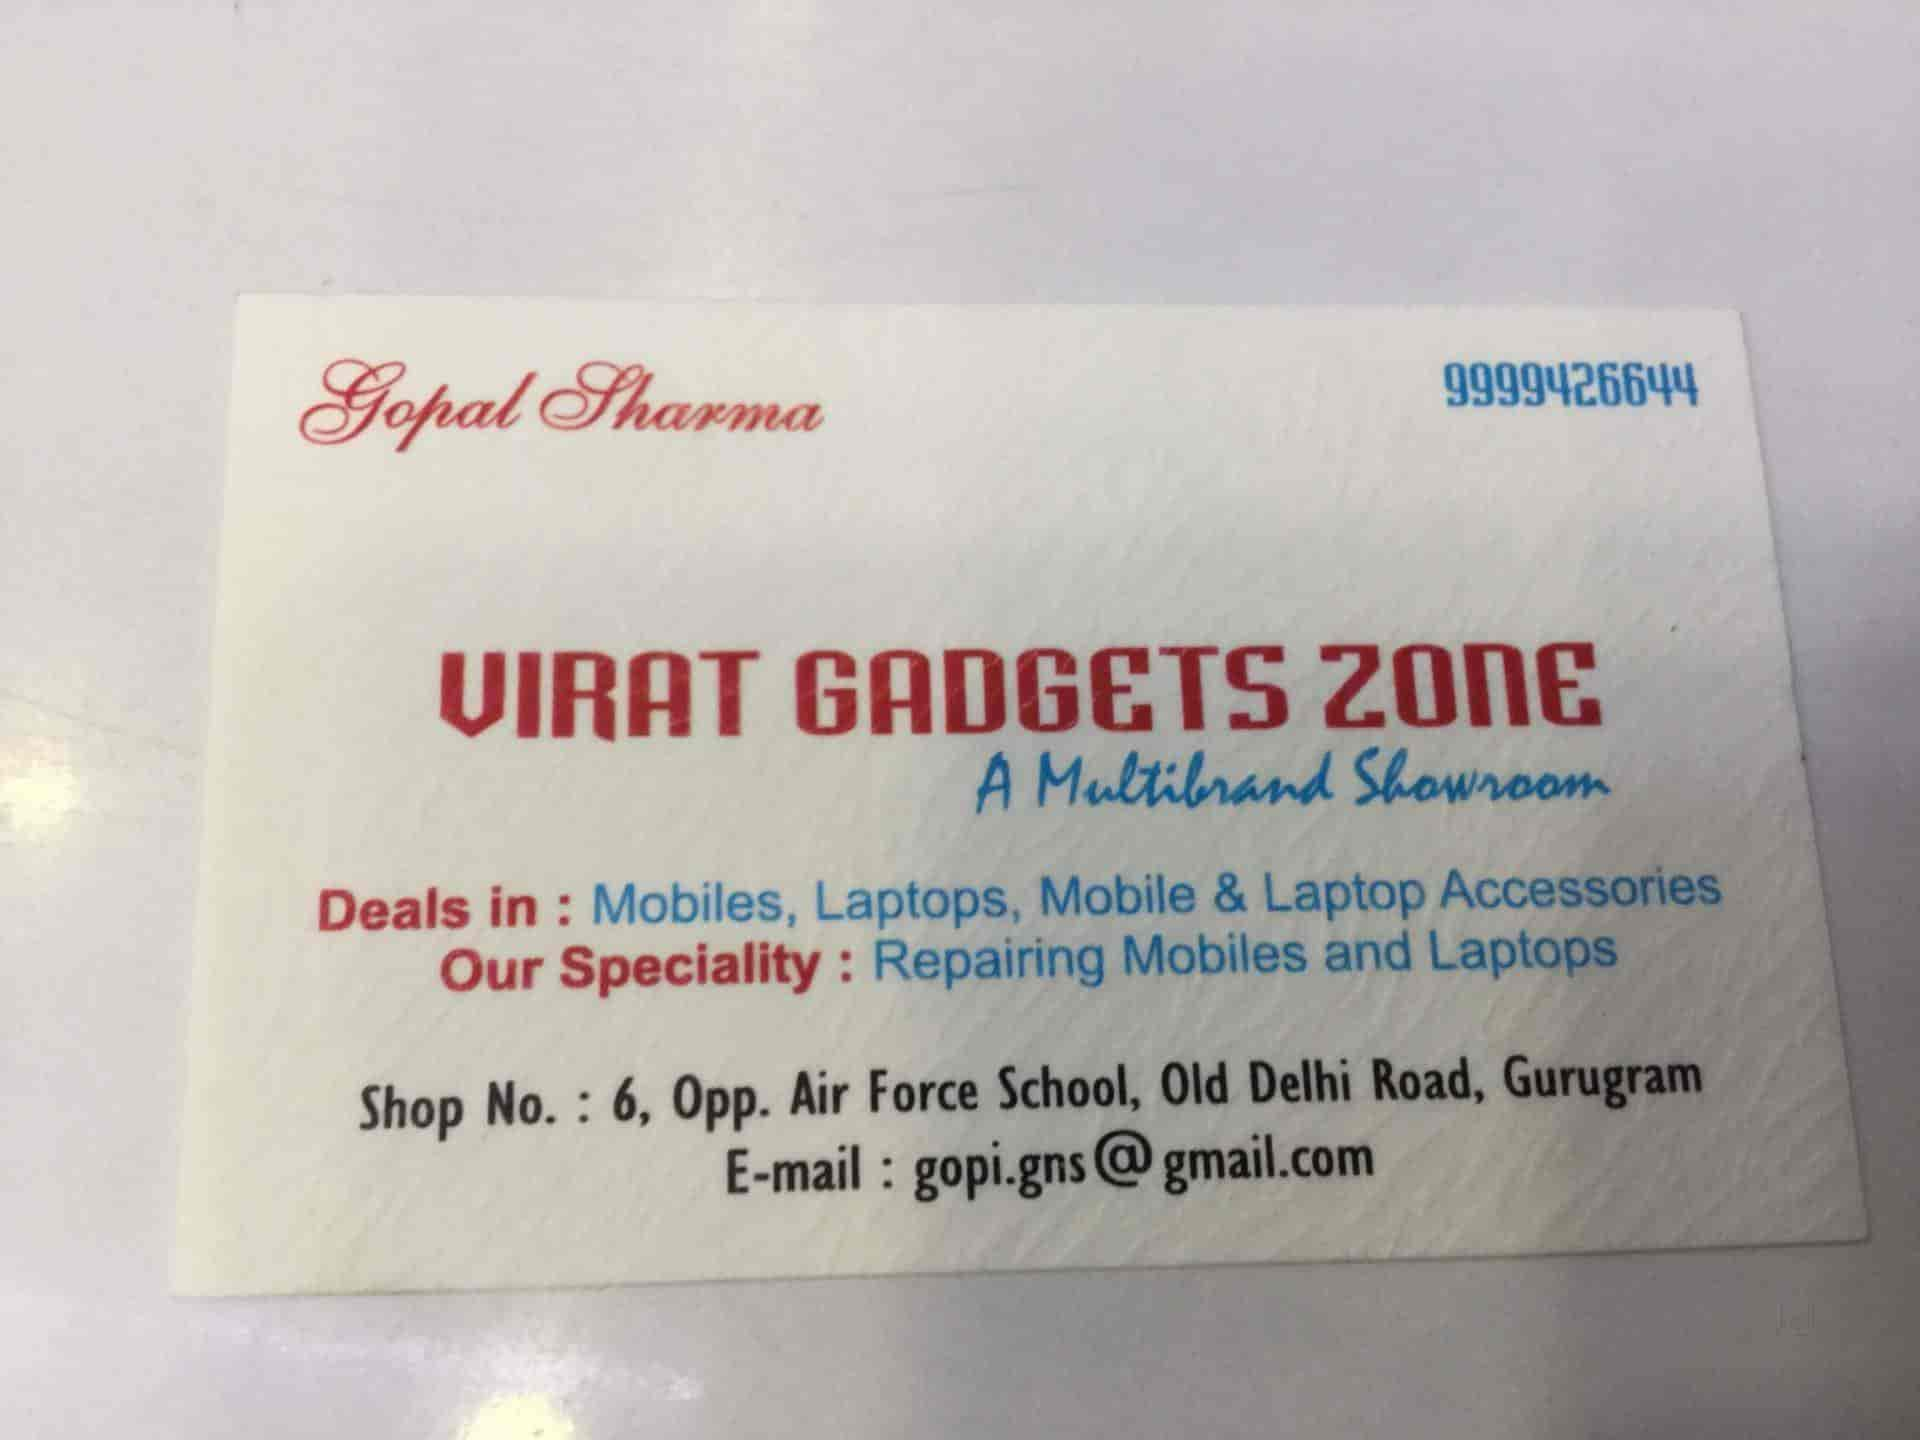 Virat Gadgets Zone Mobile Phone Repair Services In Delhi Justdial